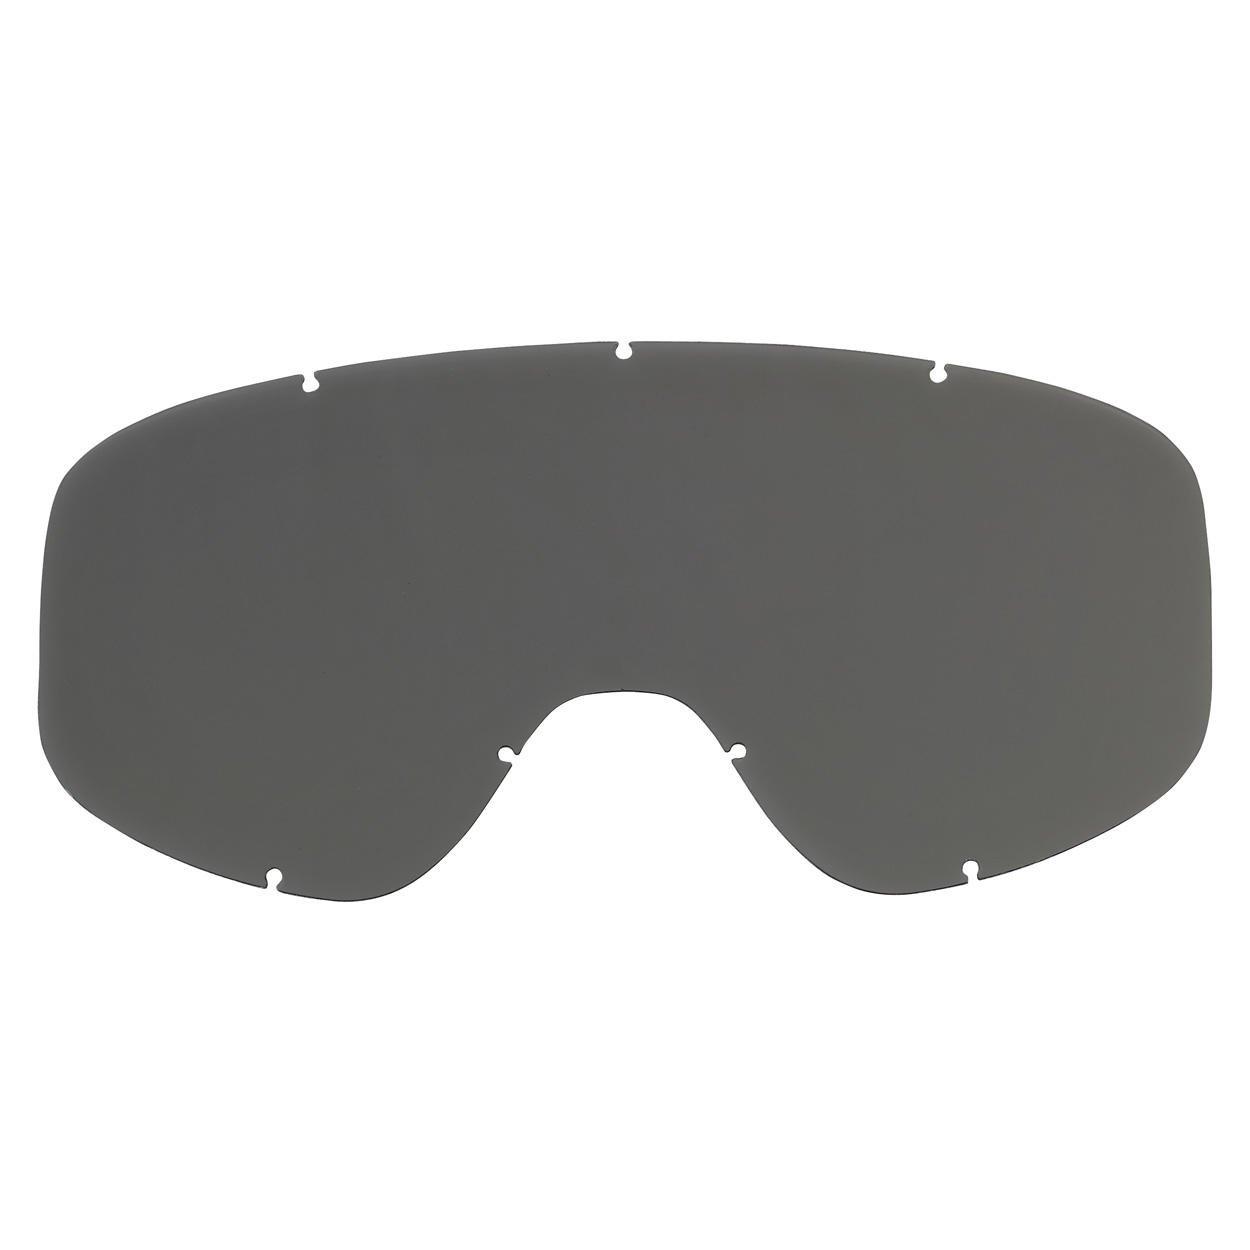 M2-SMK-SD-LX Moto 2.0 Goggle Lens One Size, Smoke Biltwell Unisex-Adults